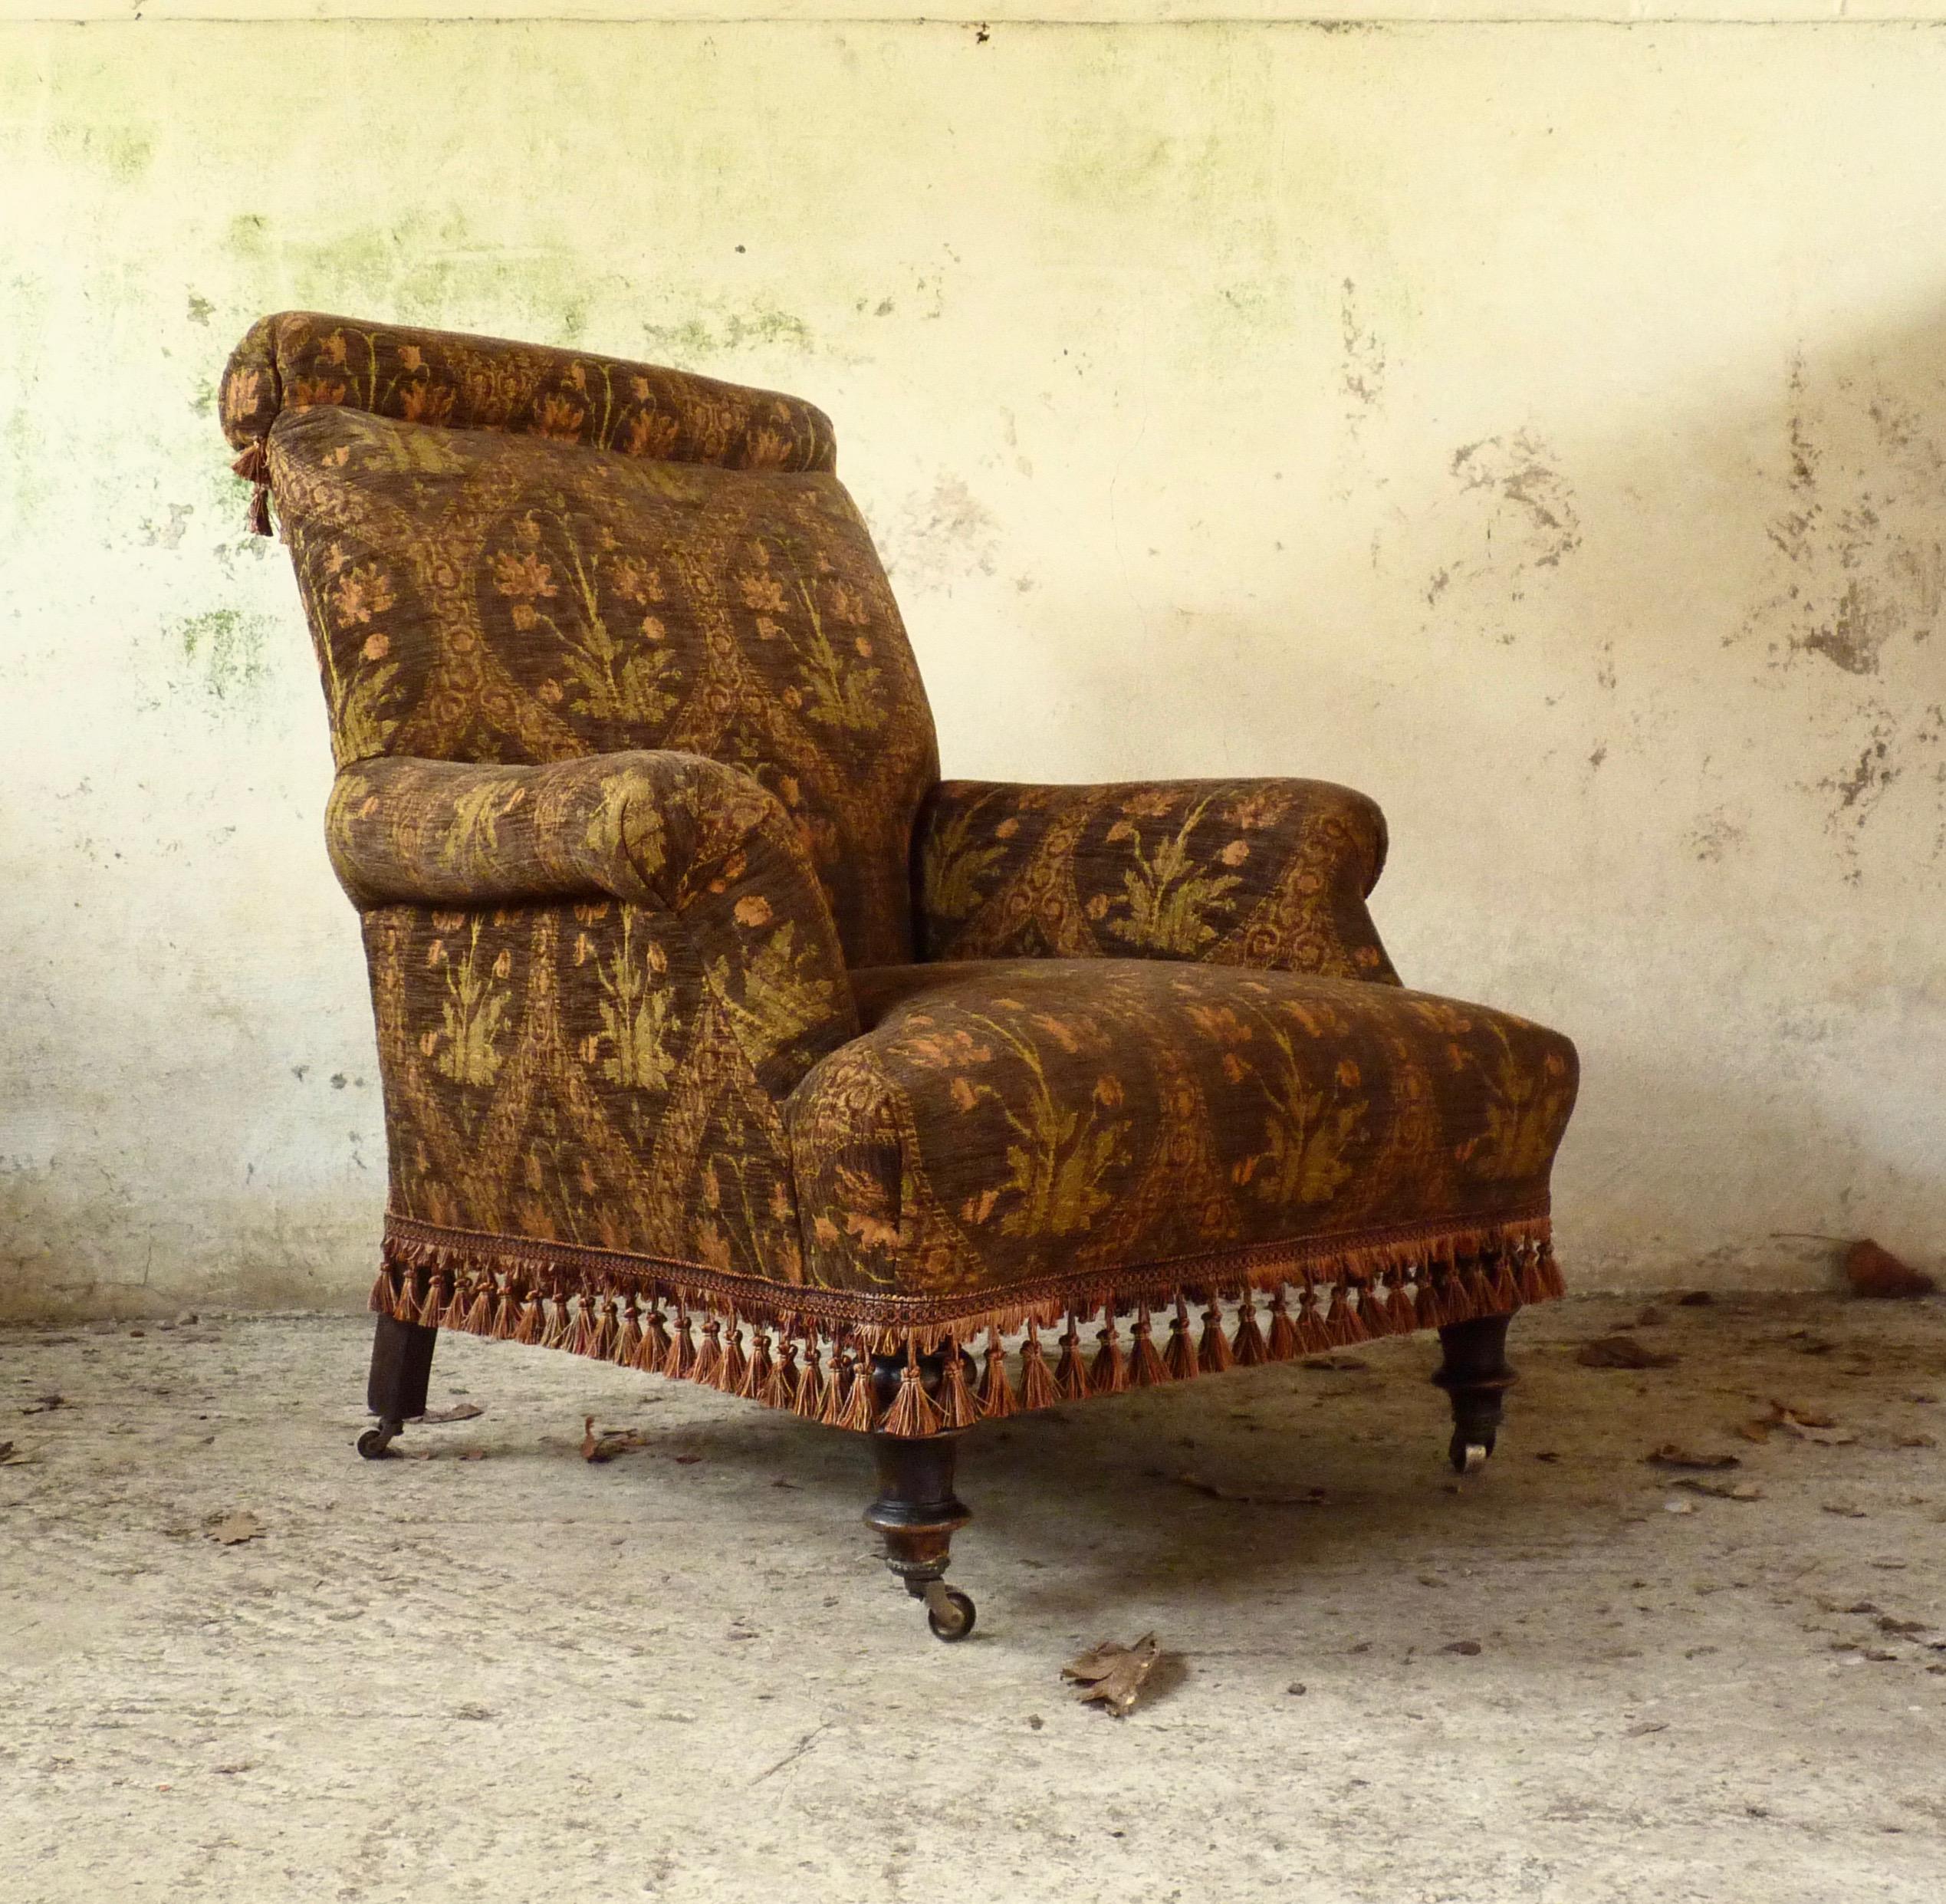 Bohemian rolltop armchair